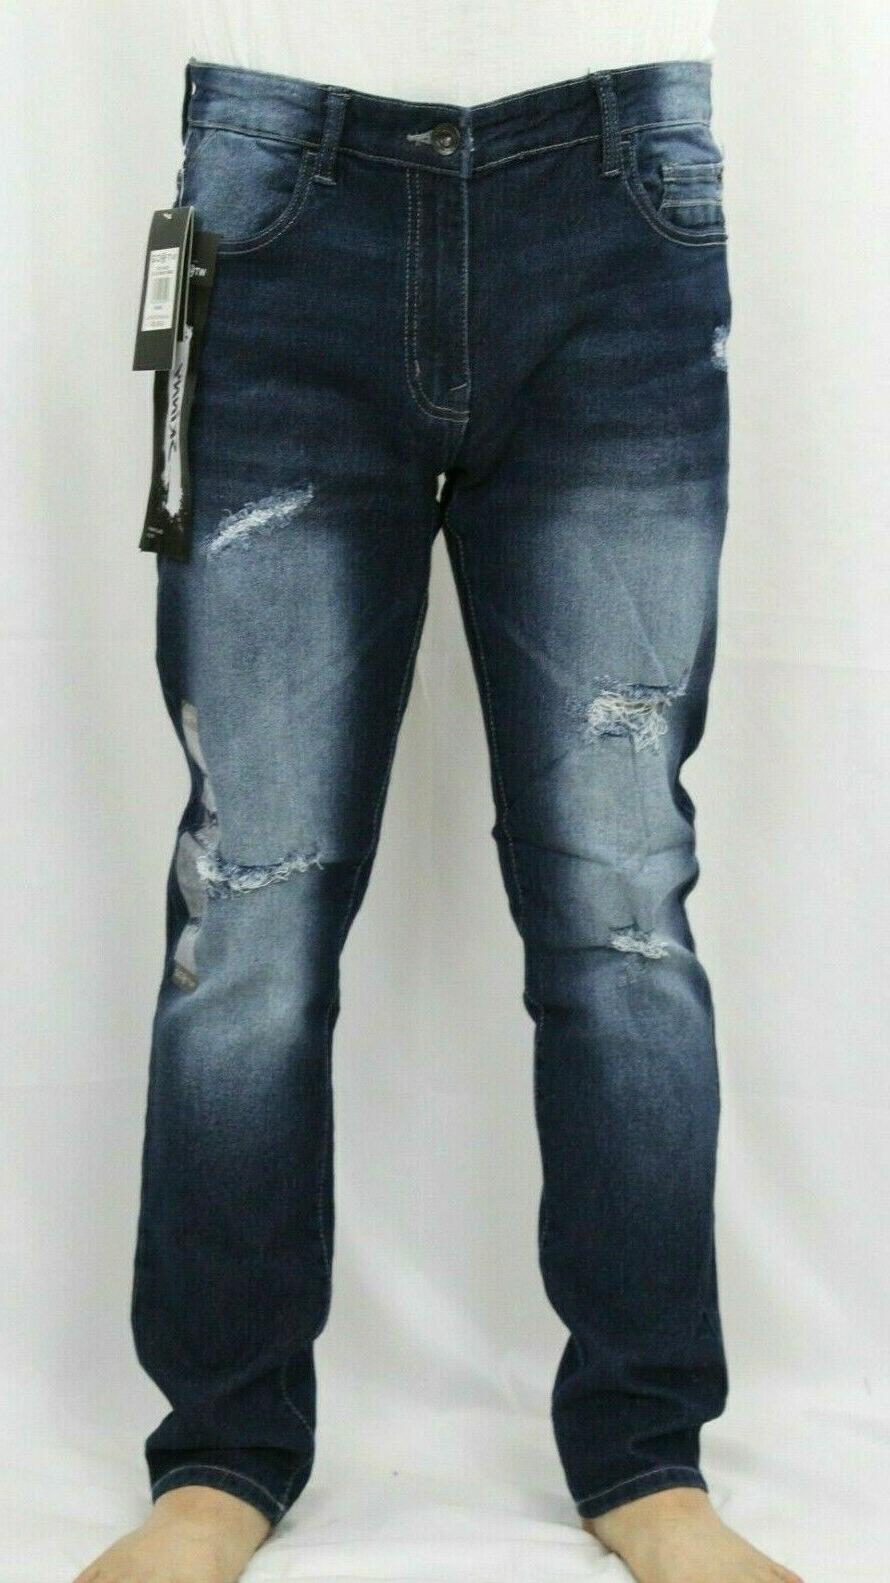 WT02 Men Ripped Pants Distressed Slim Fit